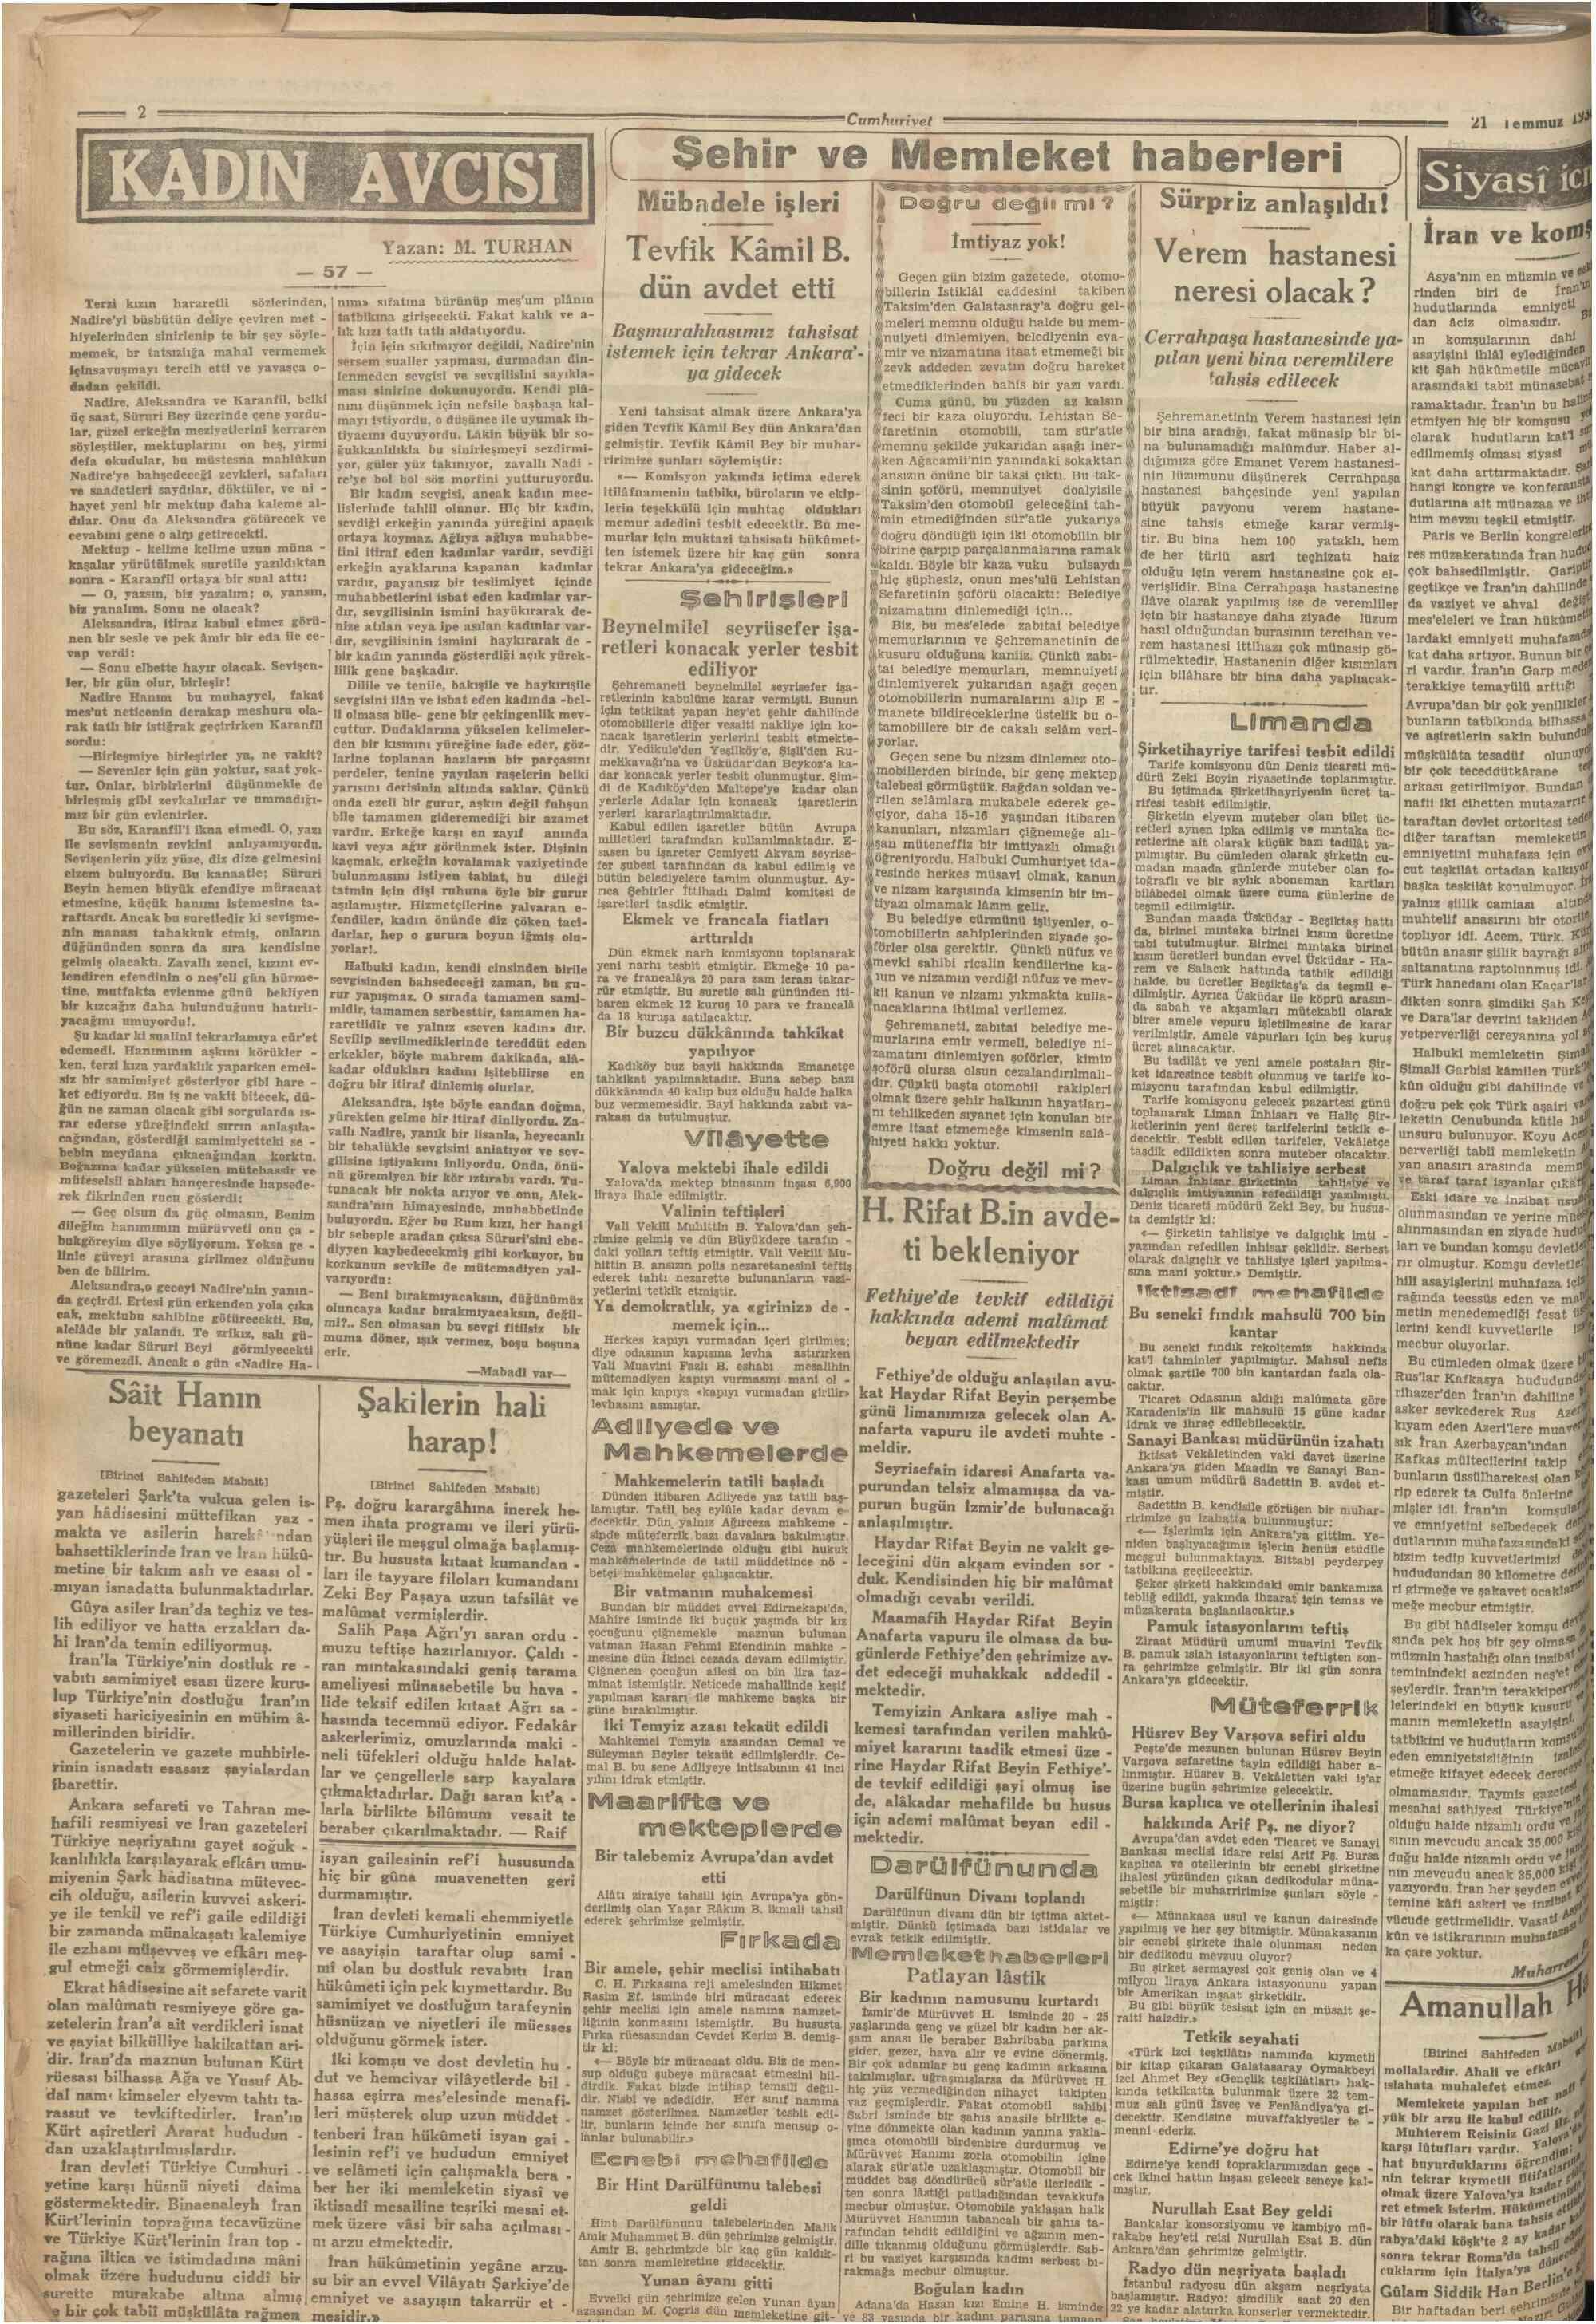 21 Temmuz 1930 Tarihli Cumhuriyet Gazetesi Sayfa 2